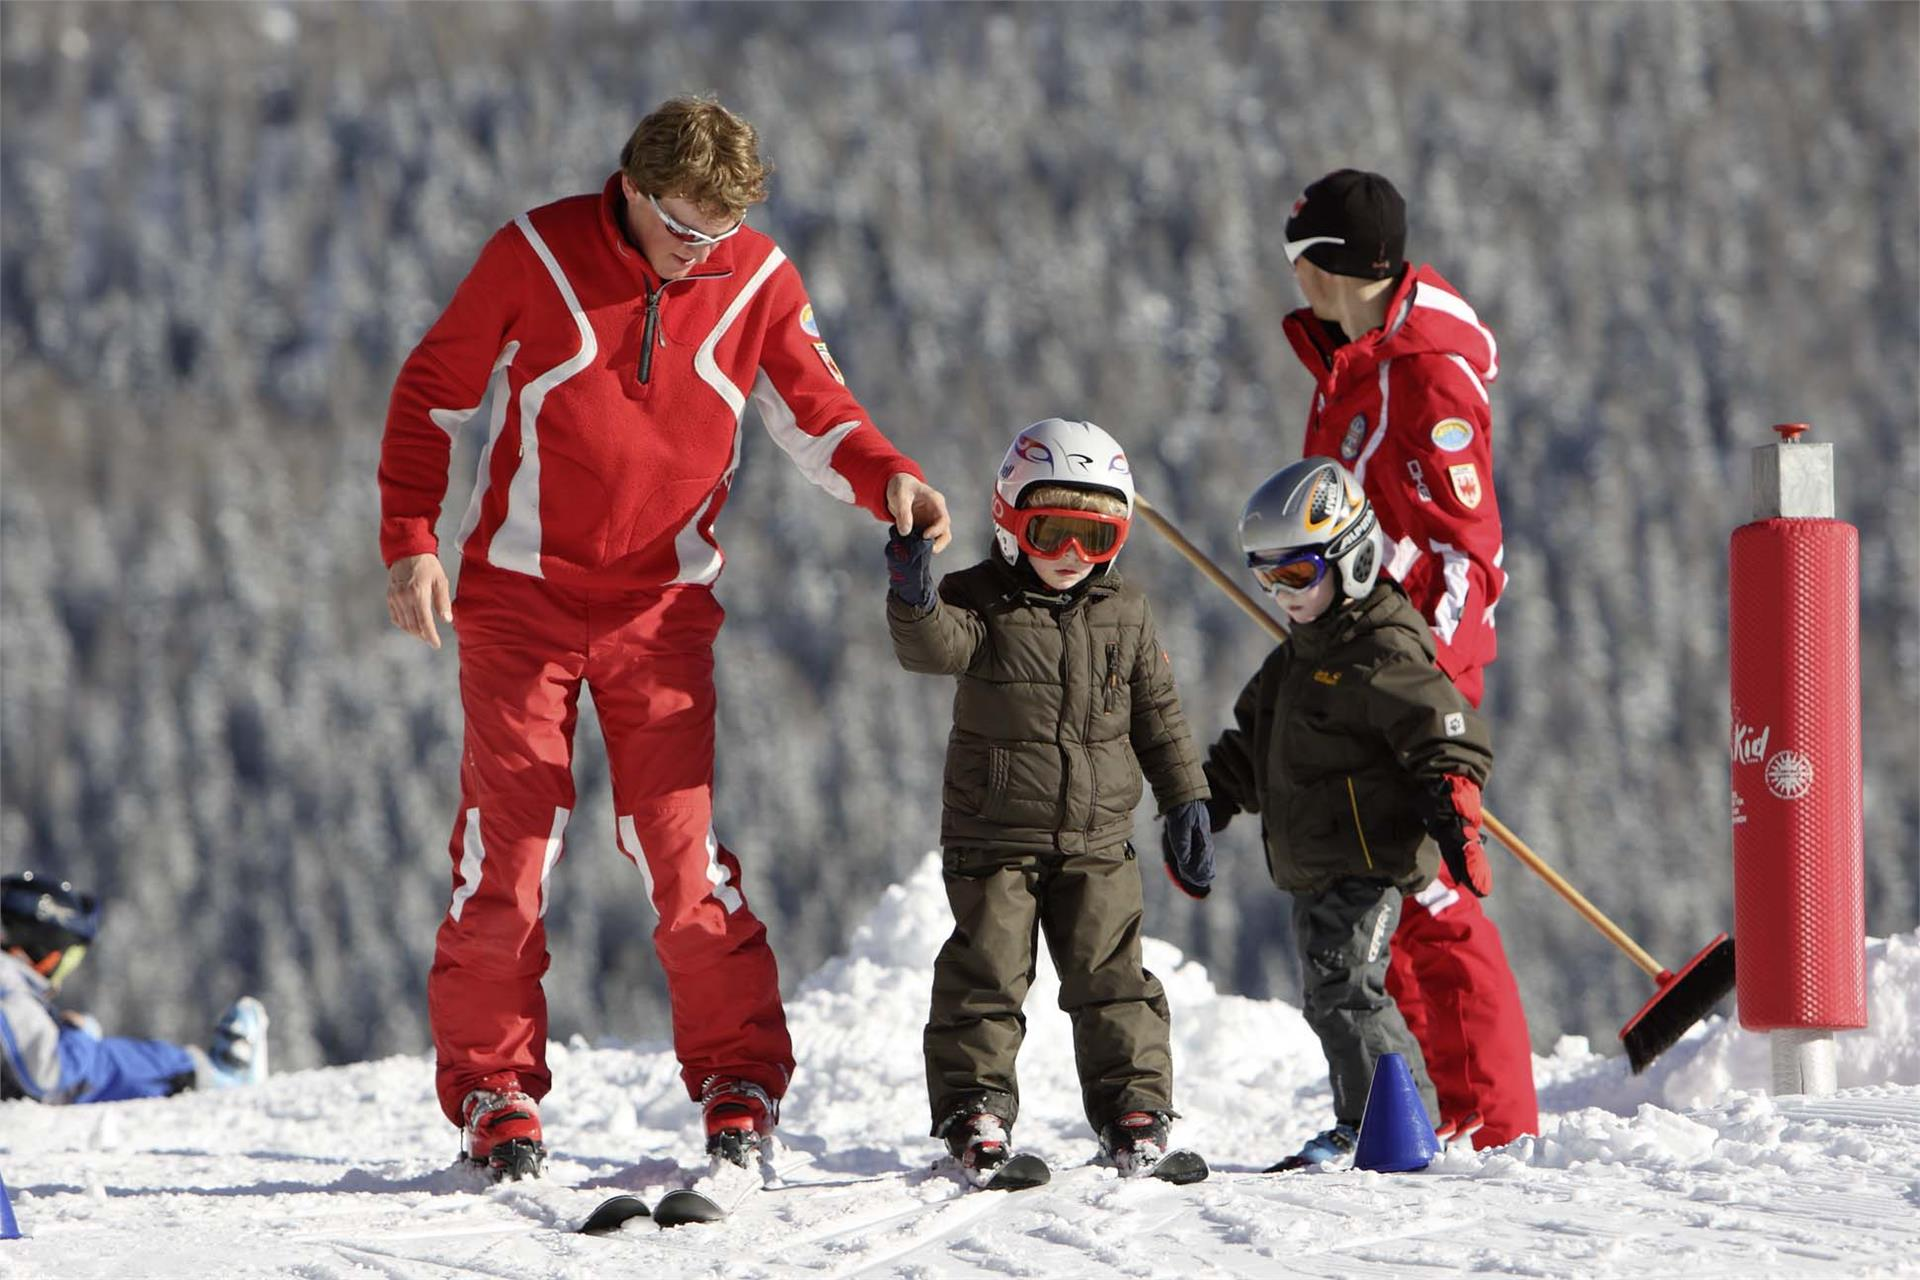 Skischule Ultental